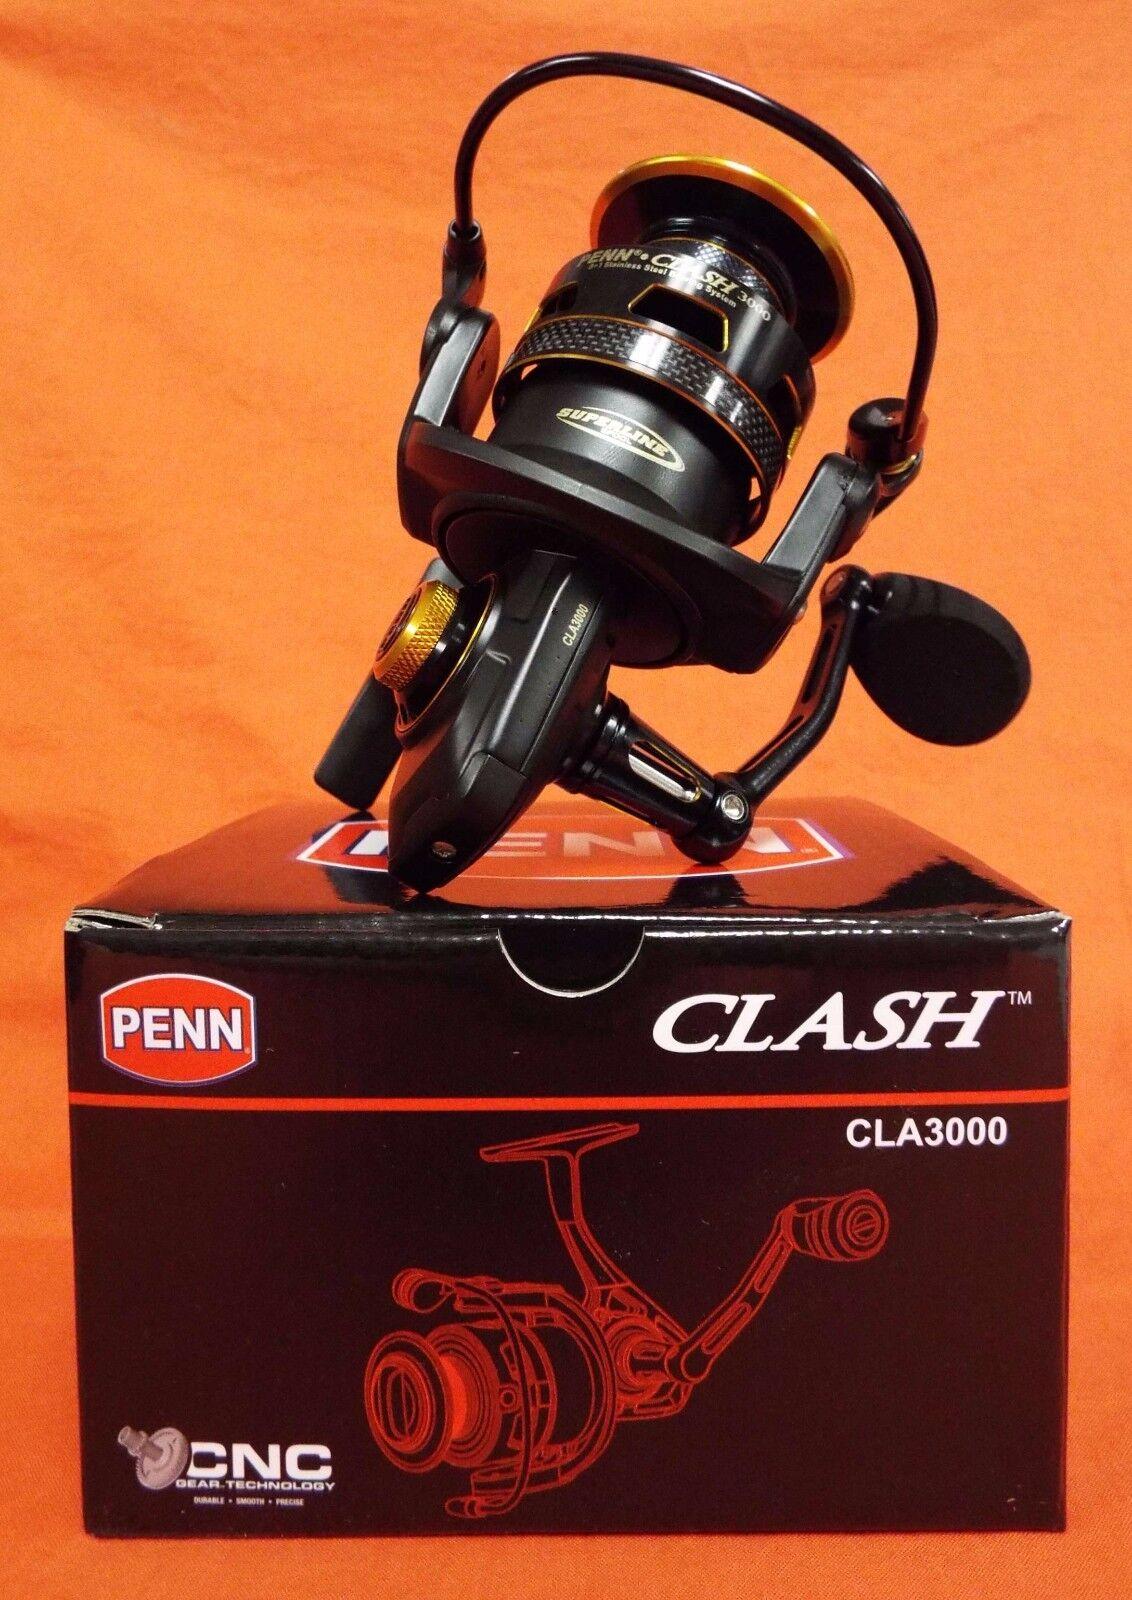 PENN Clash 3000 Spinning Reel Gear Ratio 6.2 1 (CLA3000)